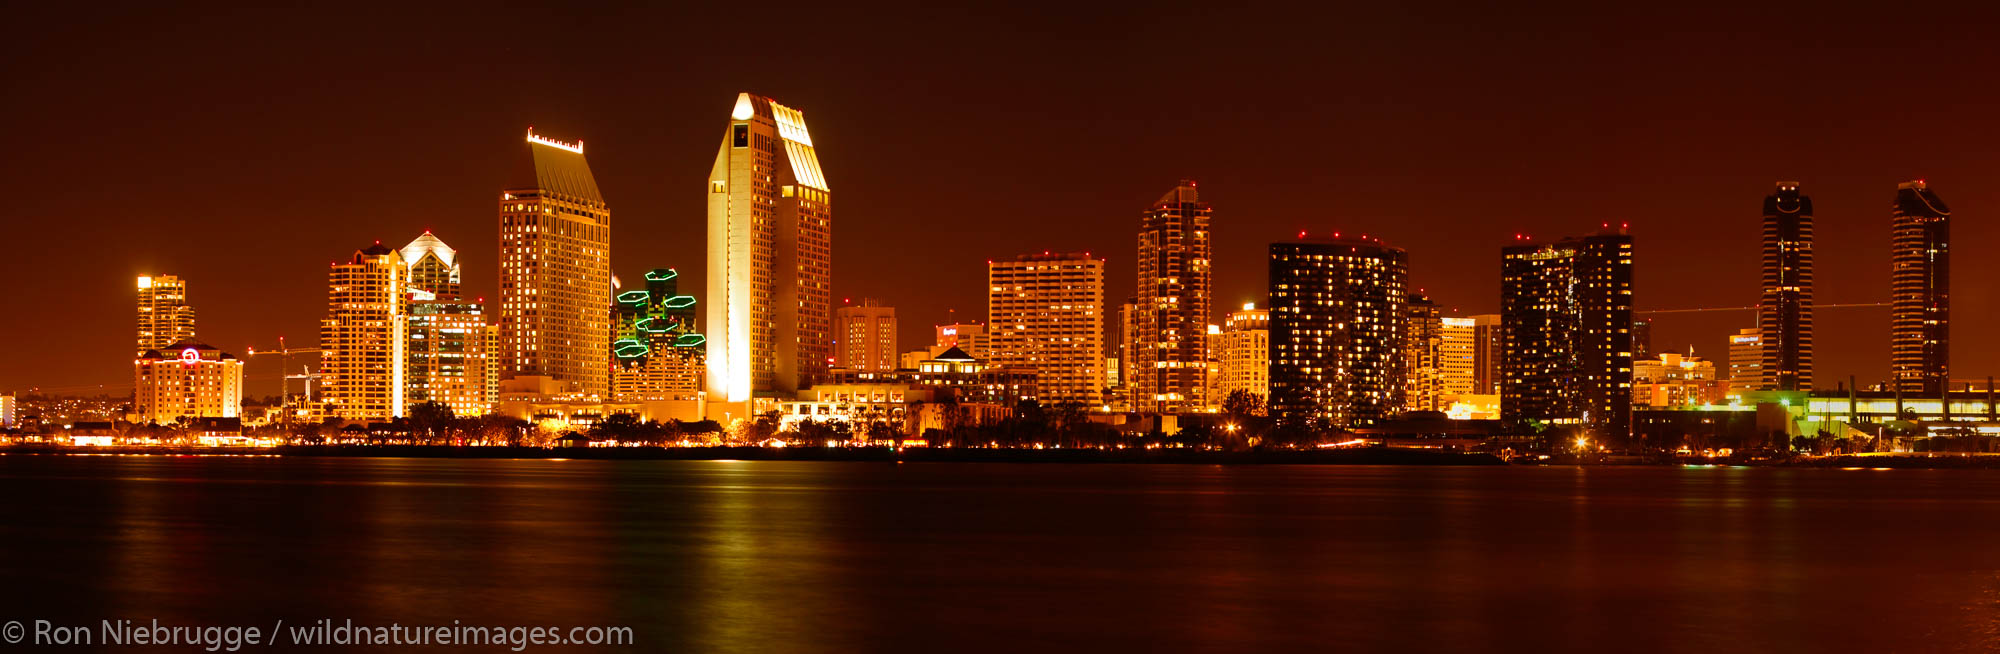 Panoramic of downtown San Diego skyline at night from Coronado Island, California.